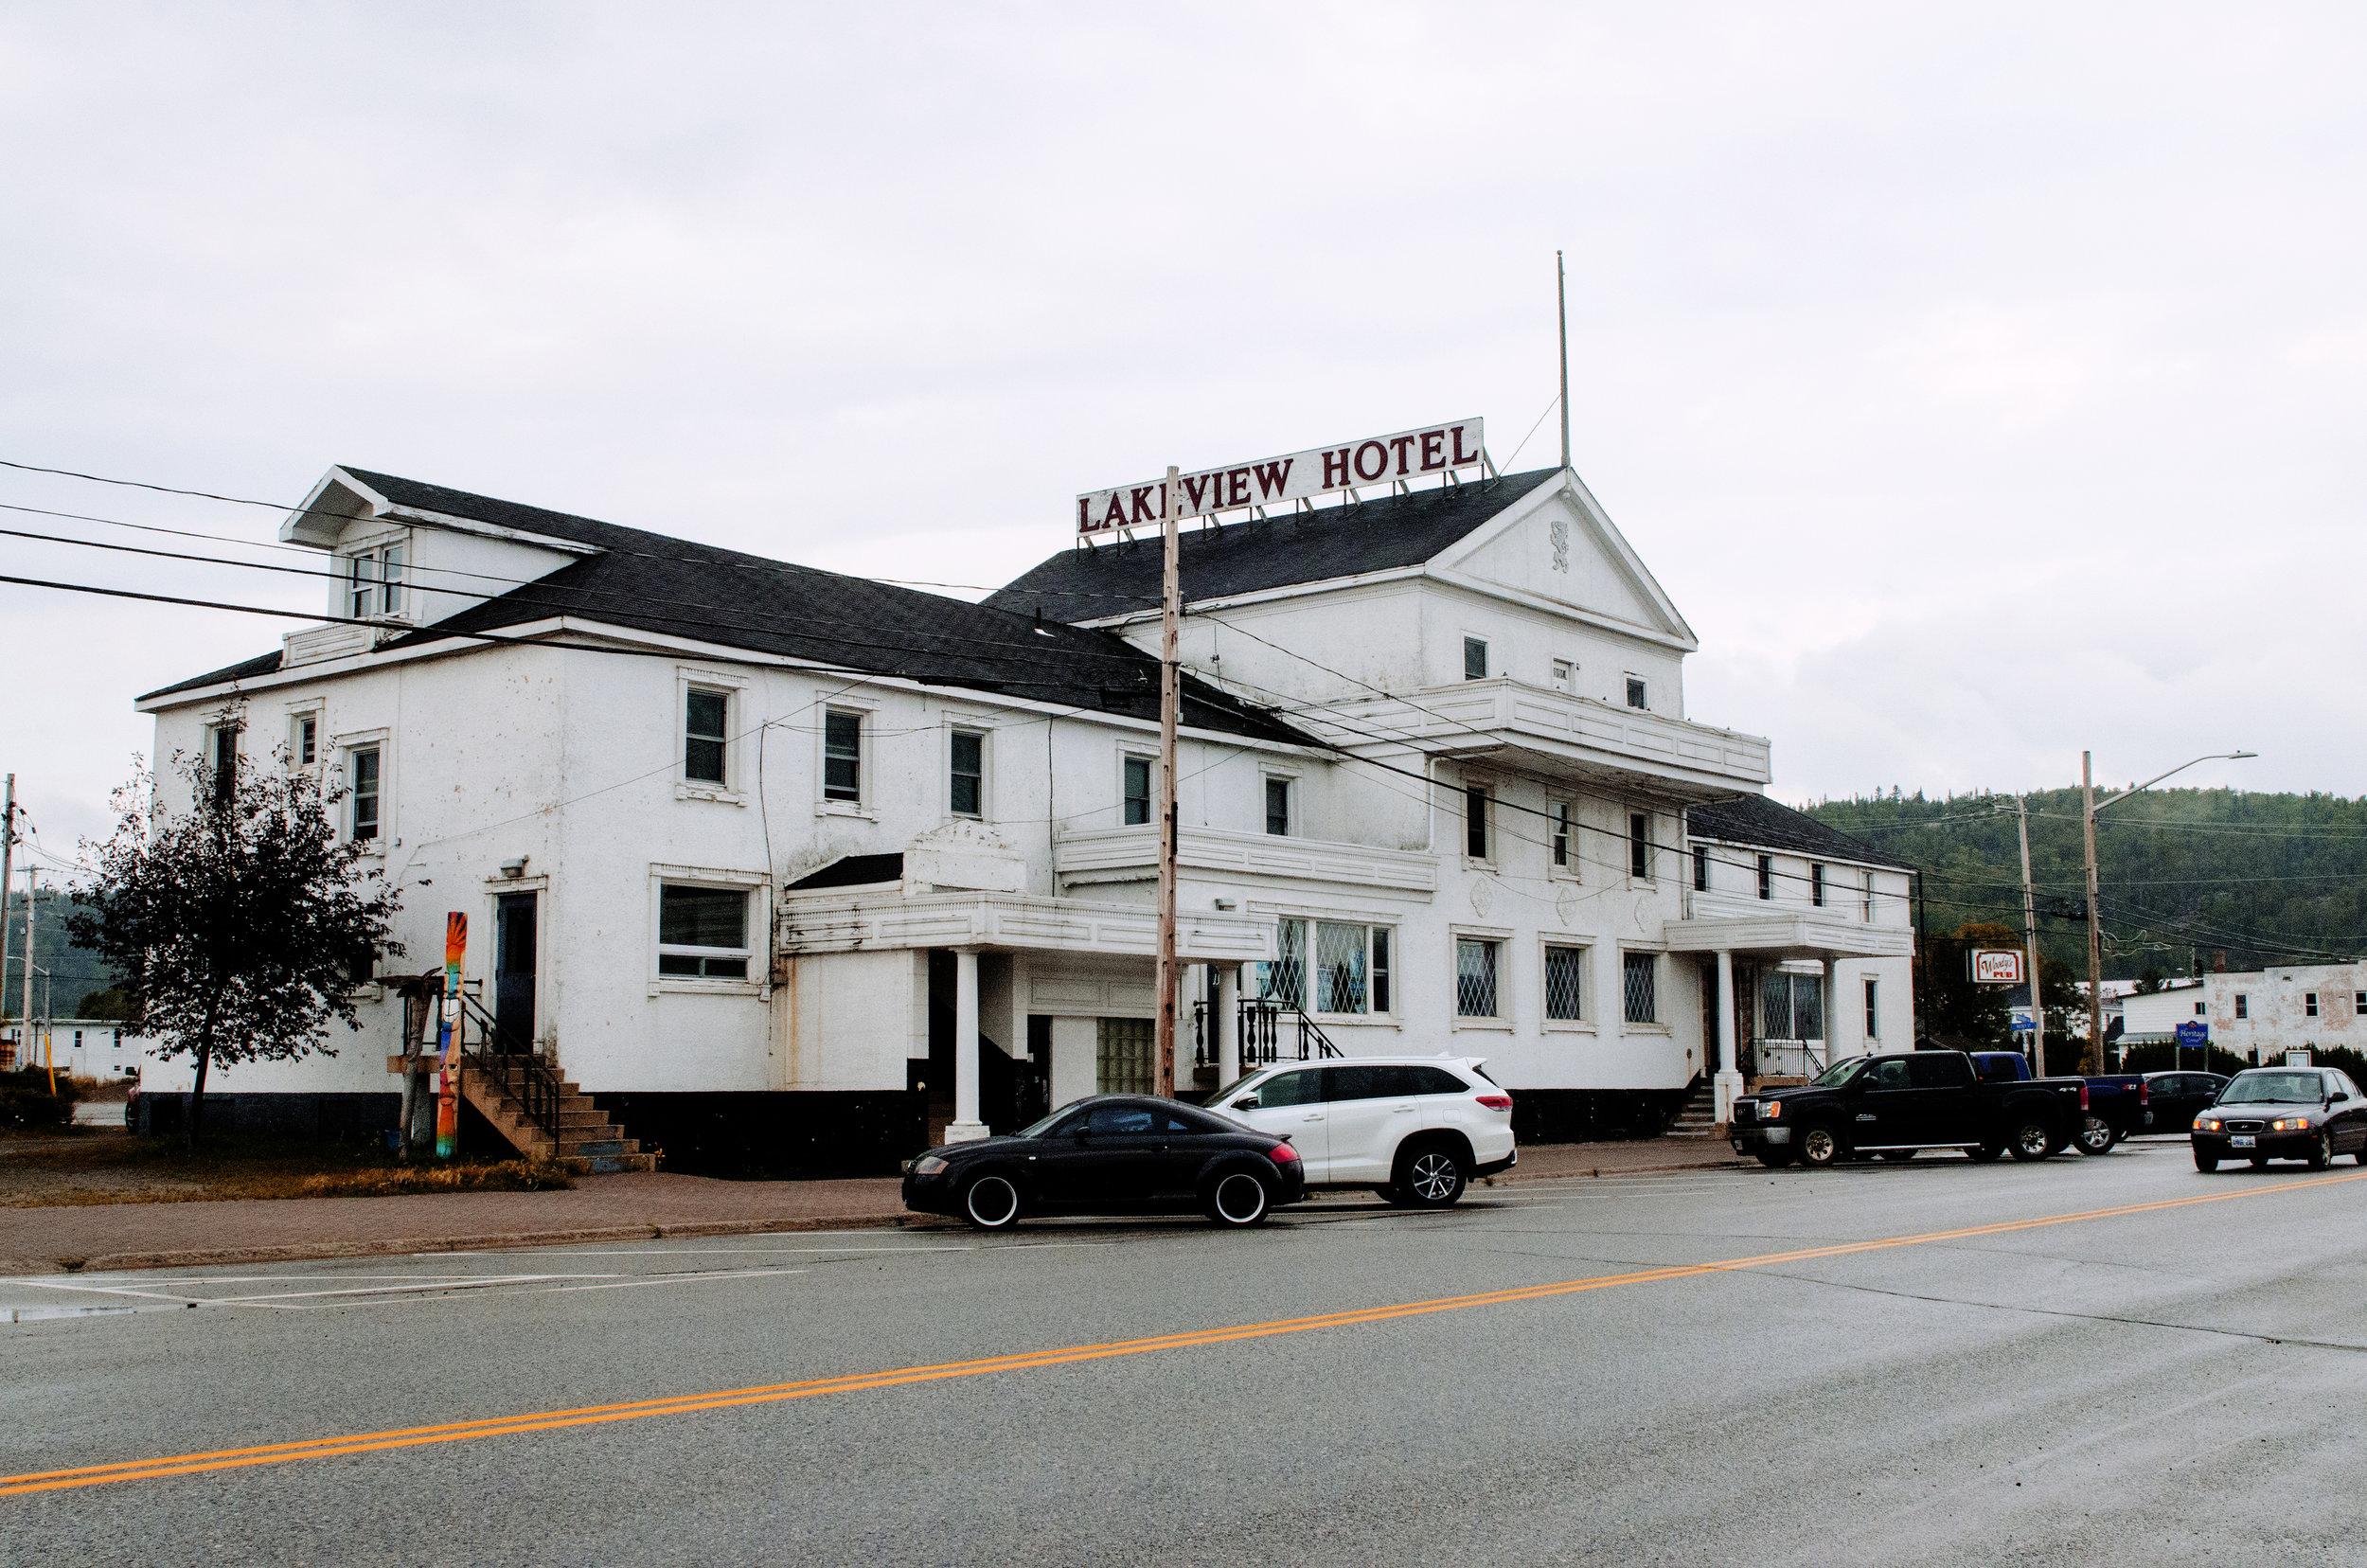 Jenkins, Cheyenne. Lakeview Hotel. 2017. Digital Photography. Wawa, Ontario